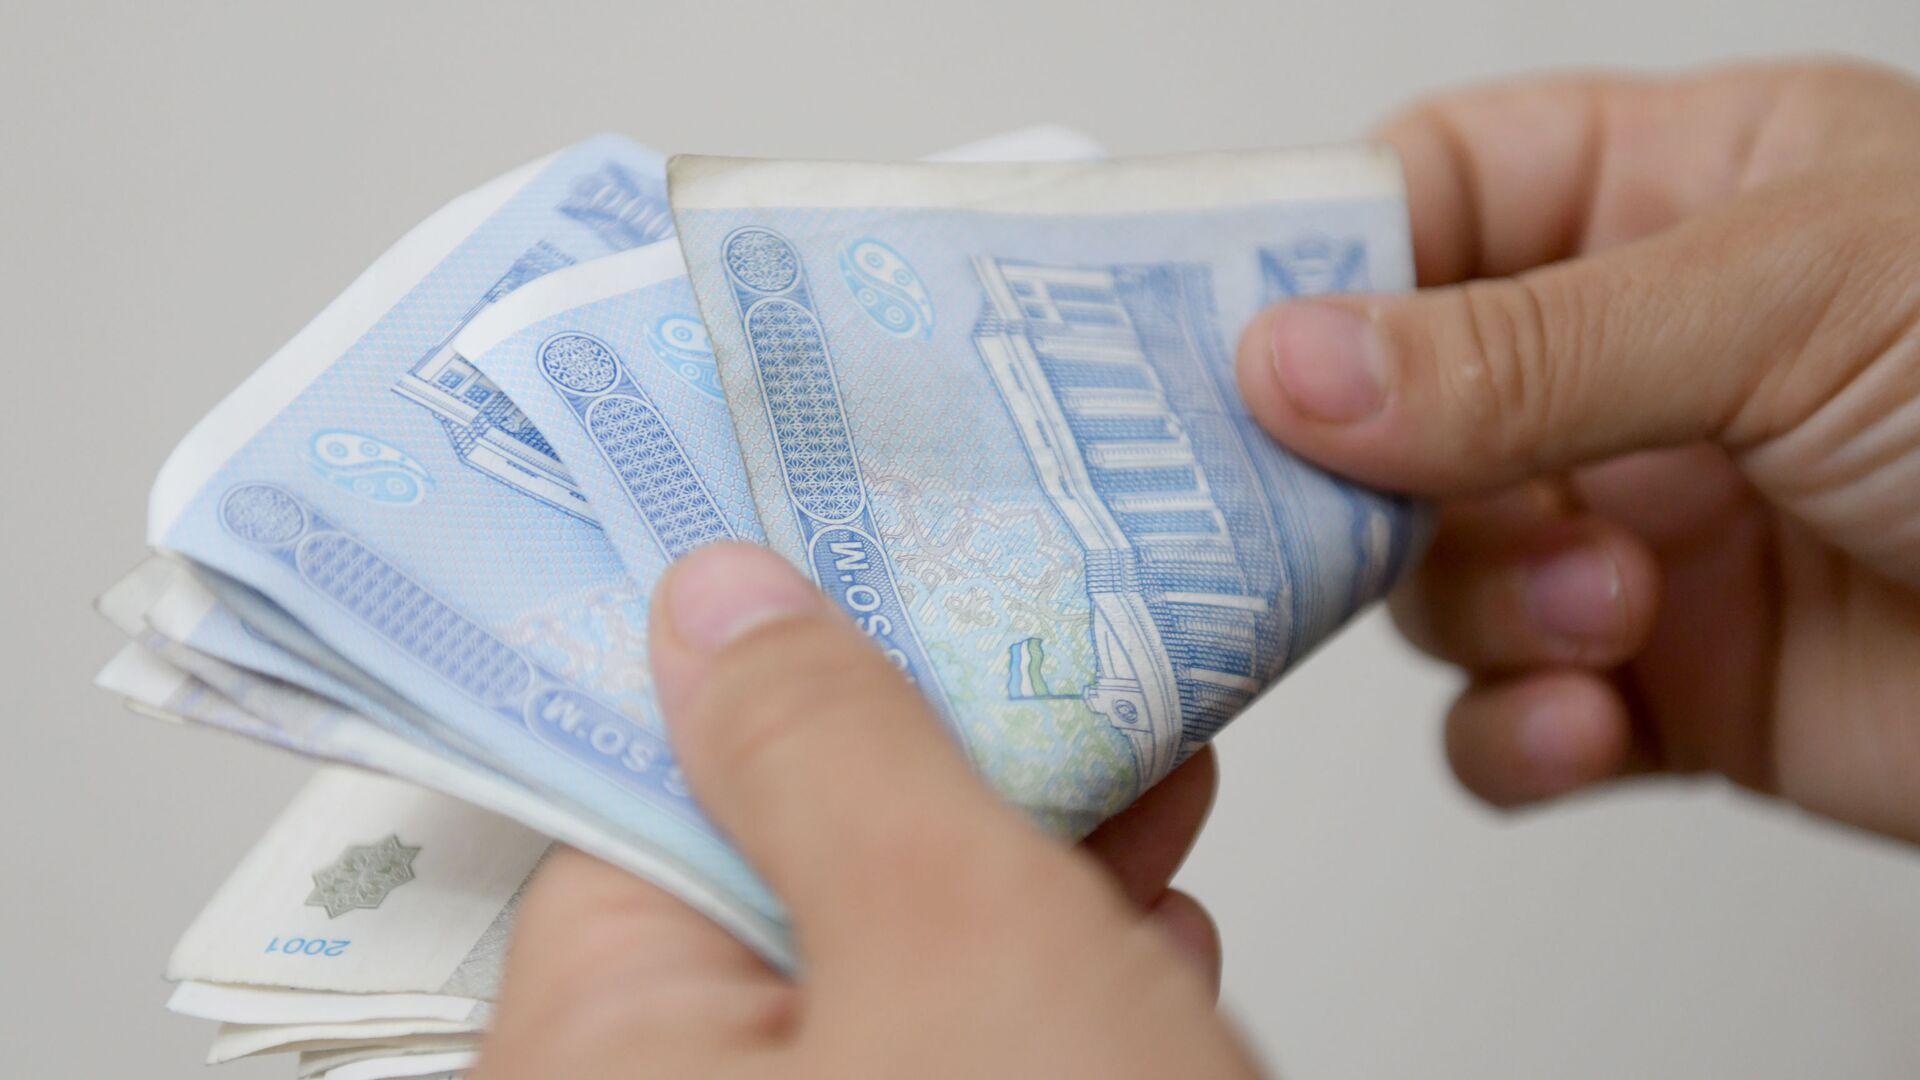 Национальная валюта Узбекистана — сум - Sputnik Ўзбекистон, 1920, 04.10.2021